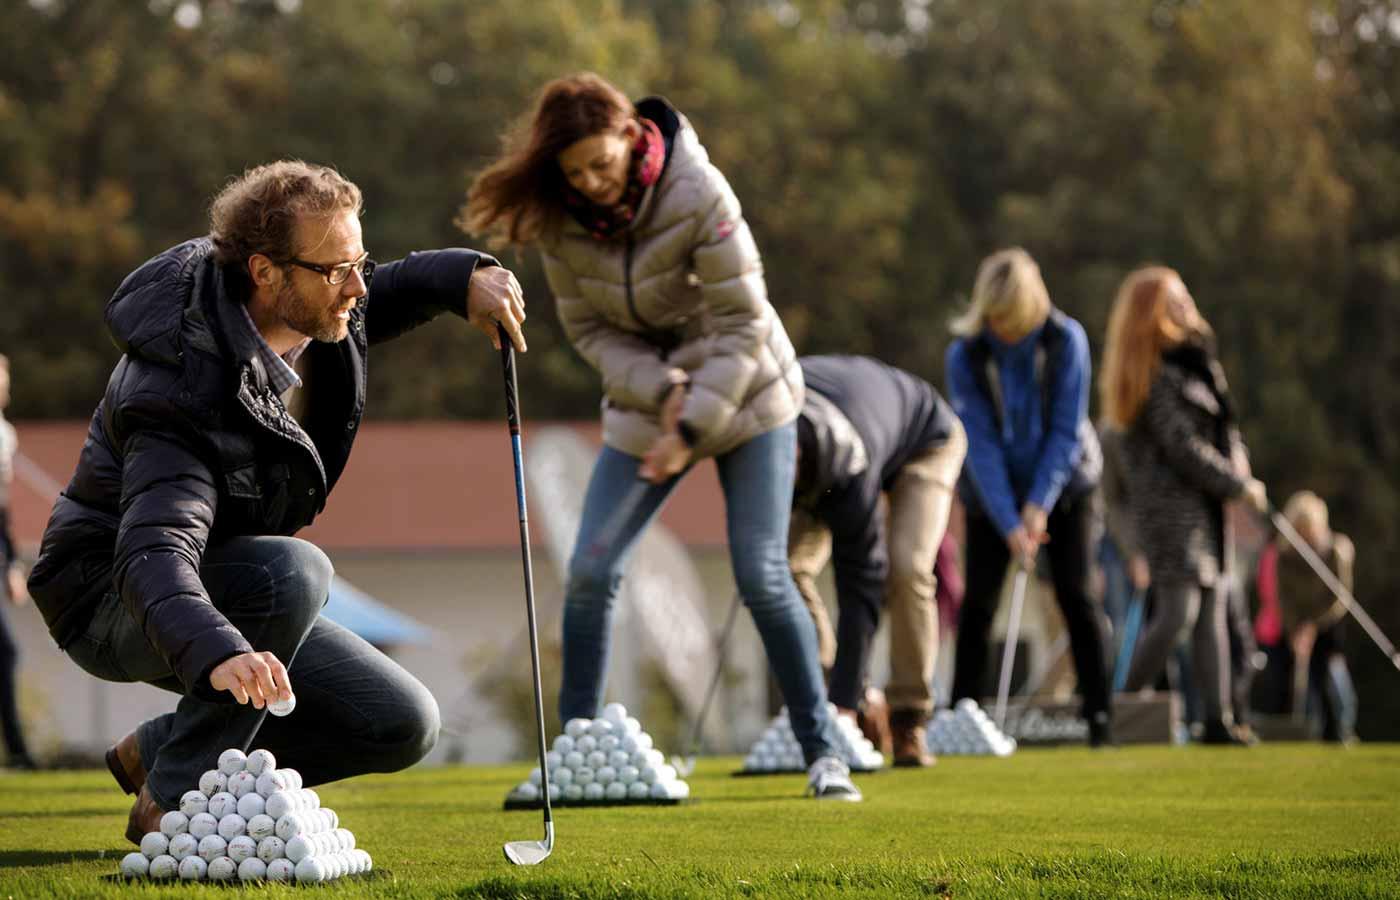 Gruppenkurse im Golfclub Bad Saarow